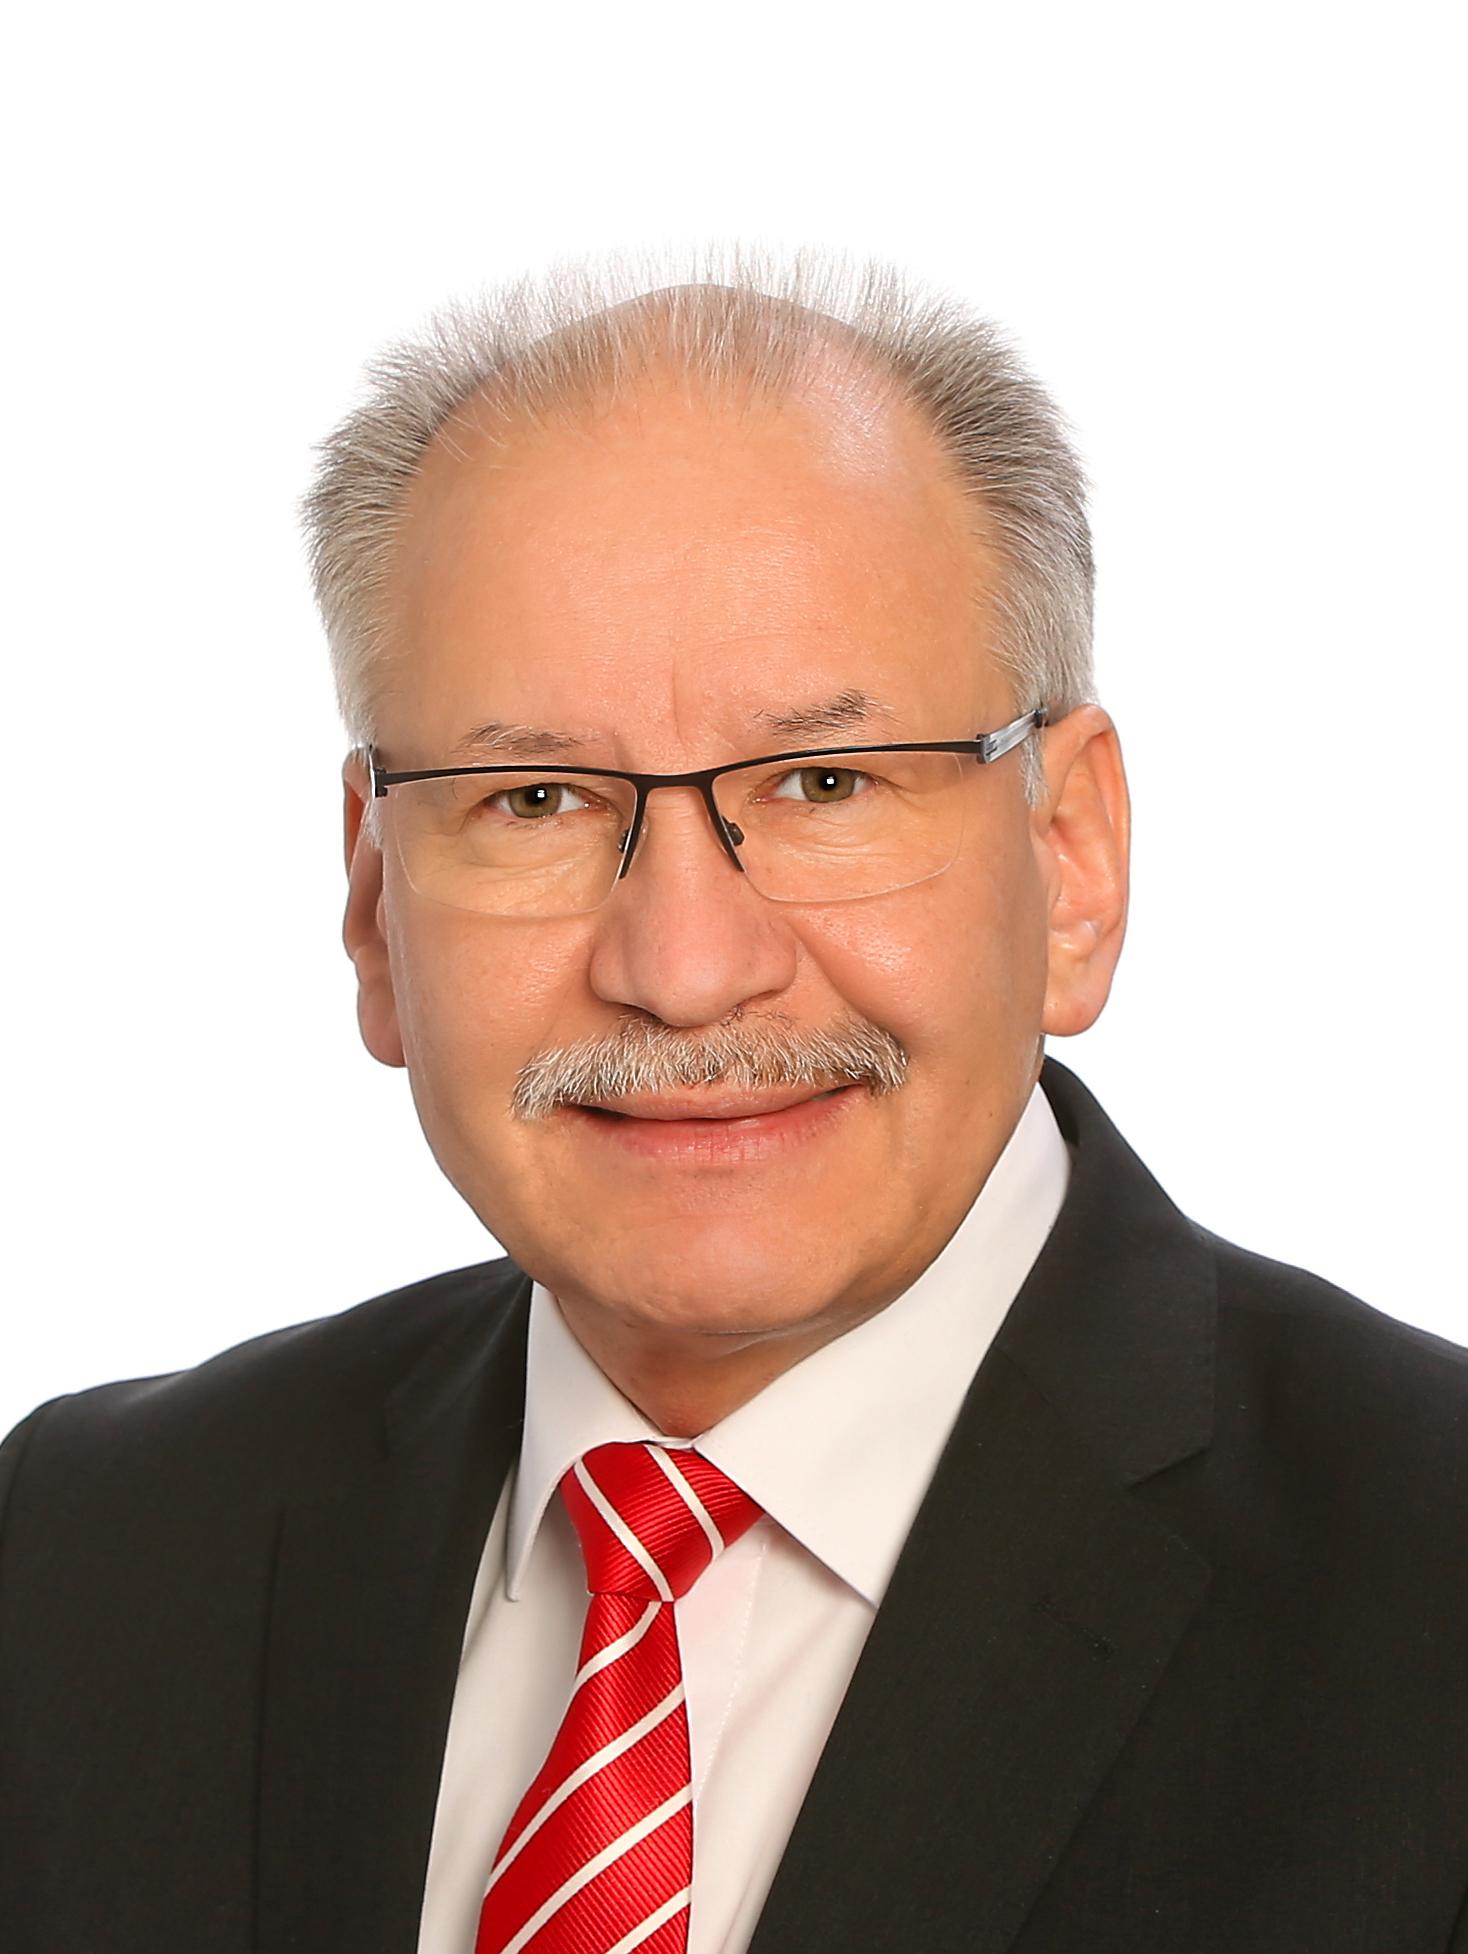 Jonas Hoffmann